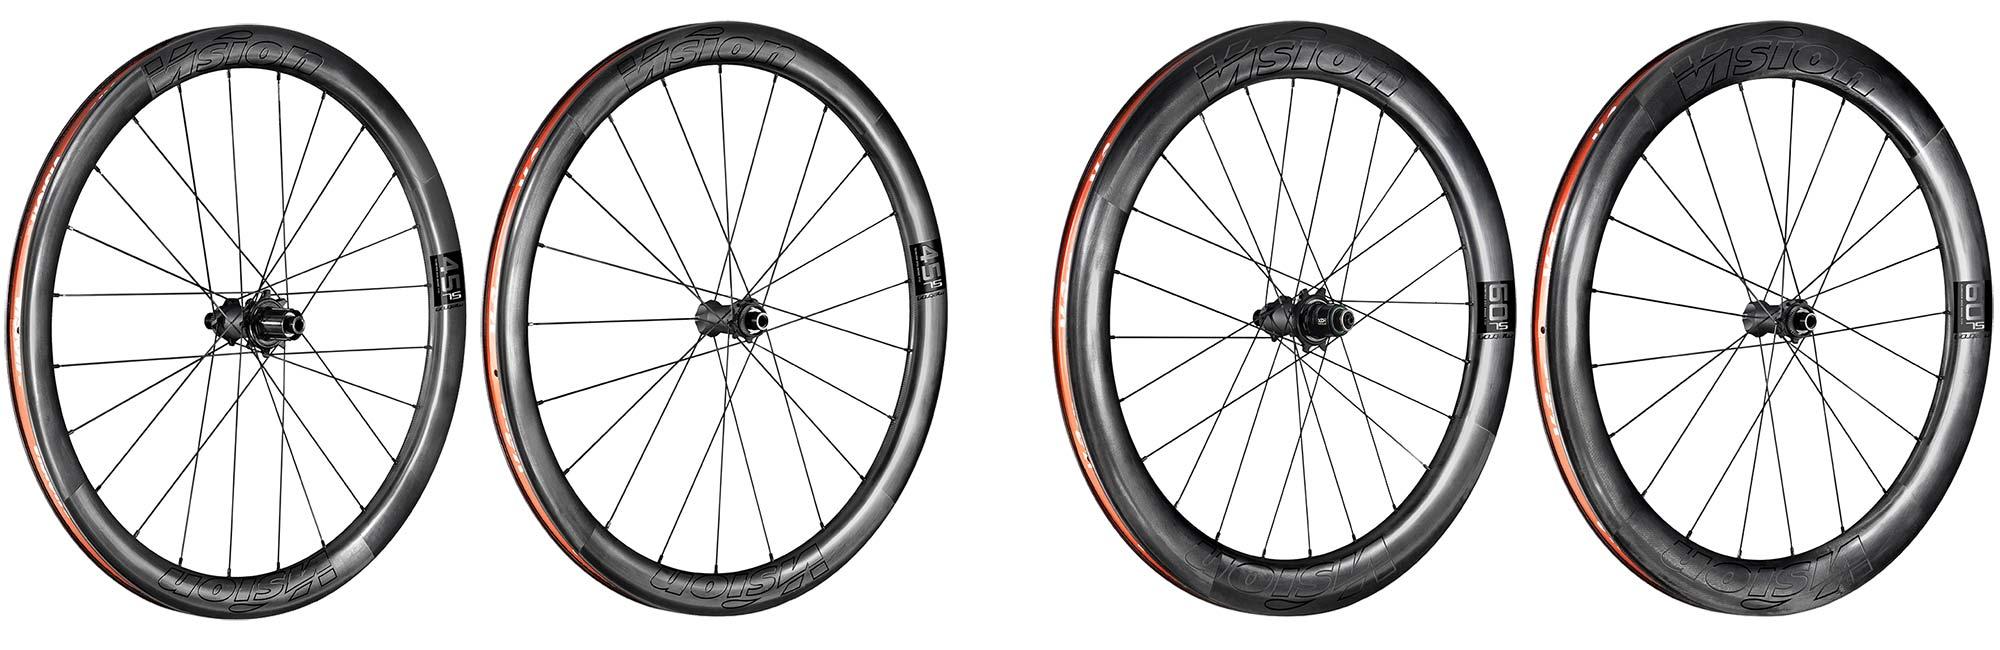 Vision Metron 45 60 SL Disc lightweight wide aero carbon road wheels, wheel options